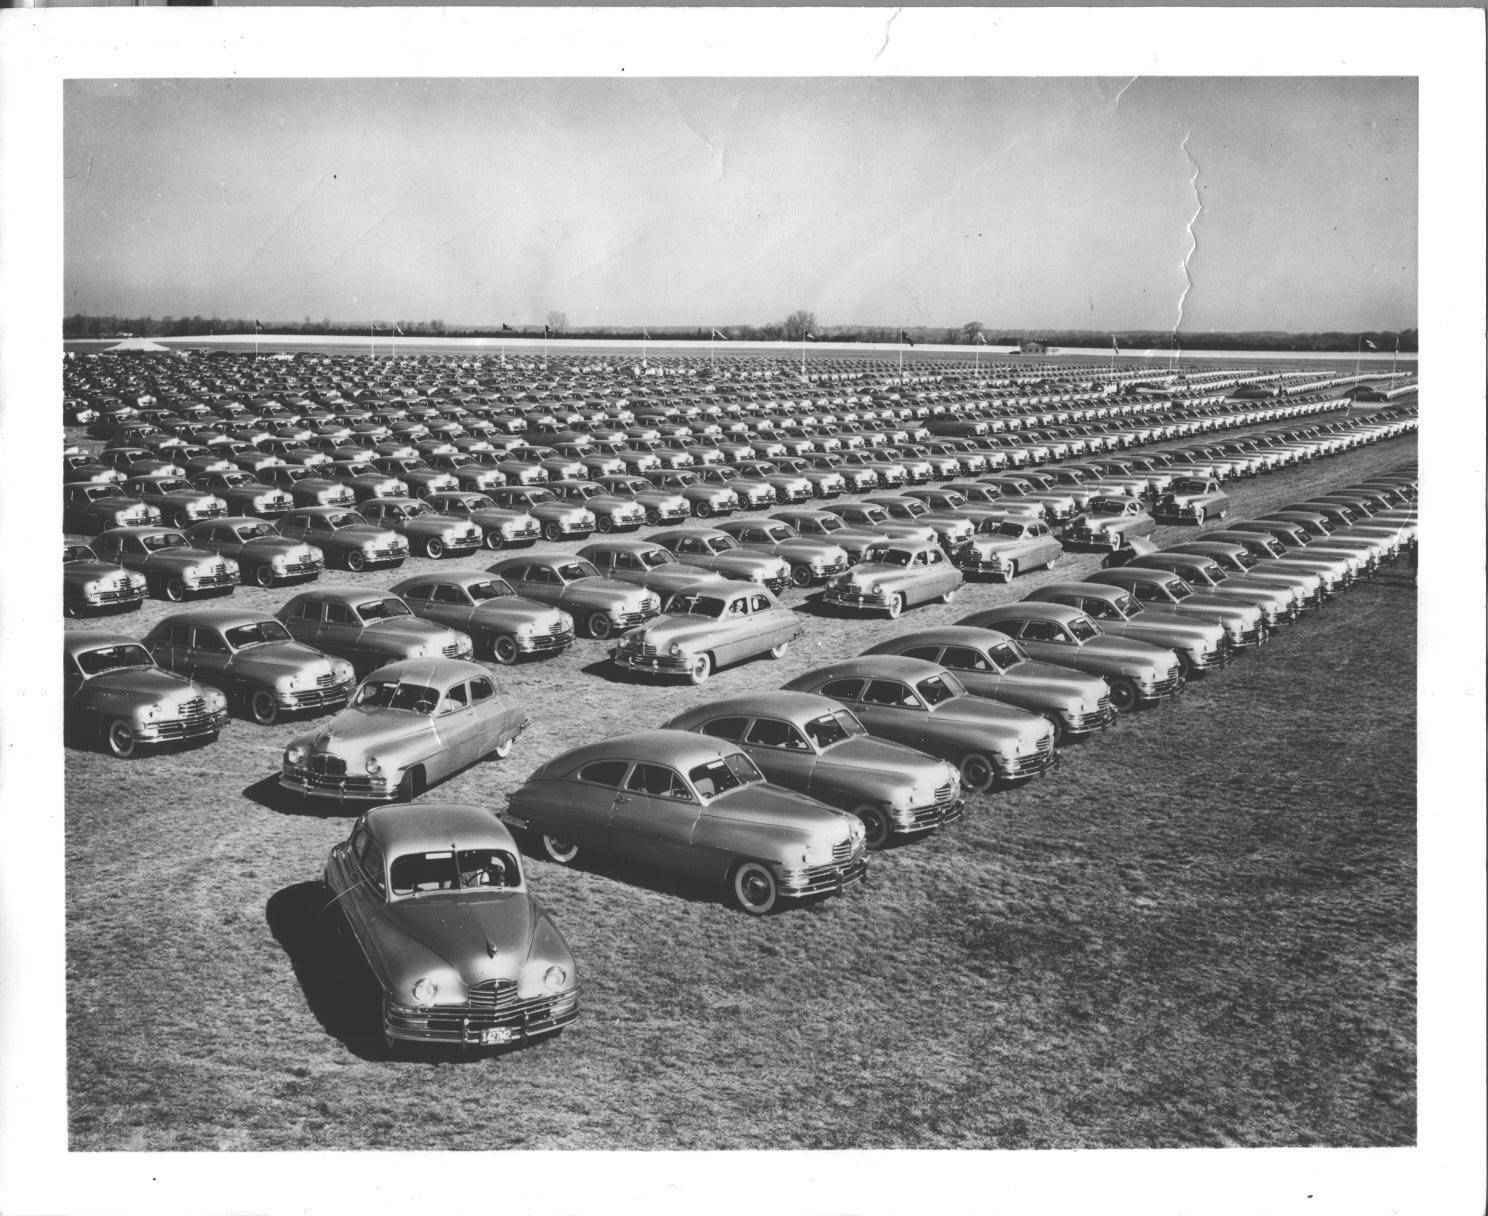 1949 PACKARD GOLDEN ANNIVERSARY PHOTO-B&W - 1 of 2